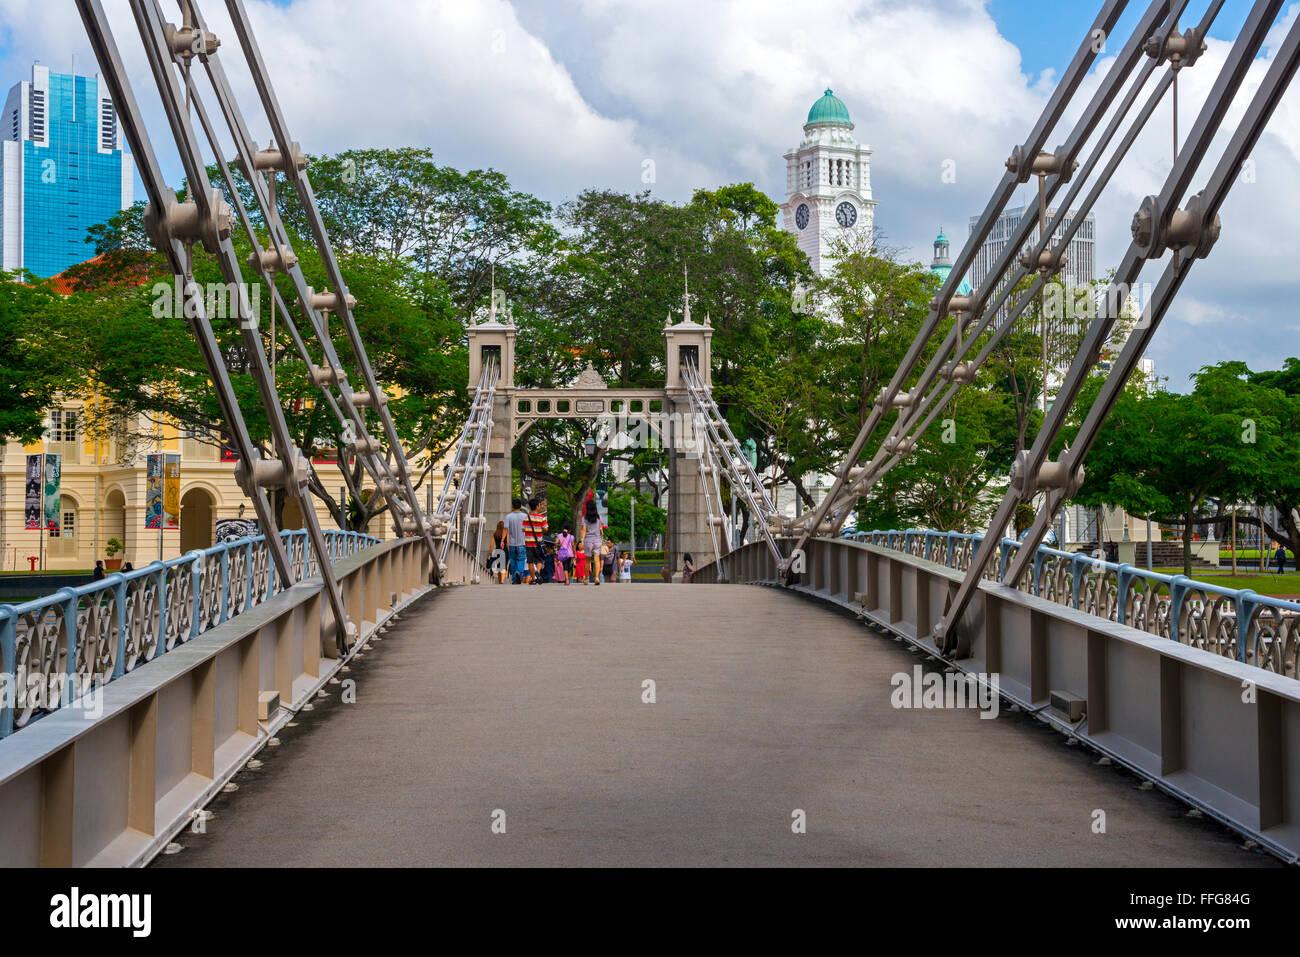 Cavenagh Bridge and Cultural District, Singapore - Stock Image